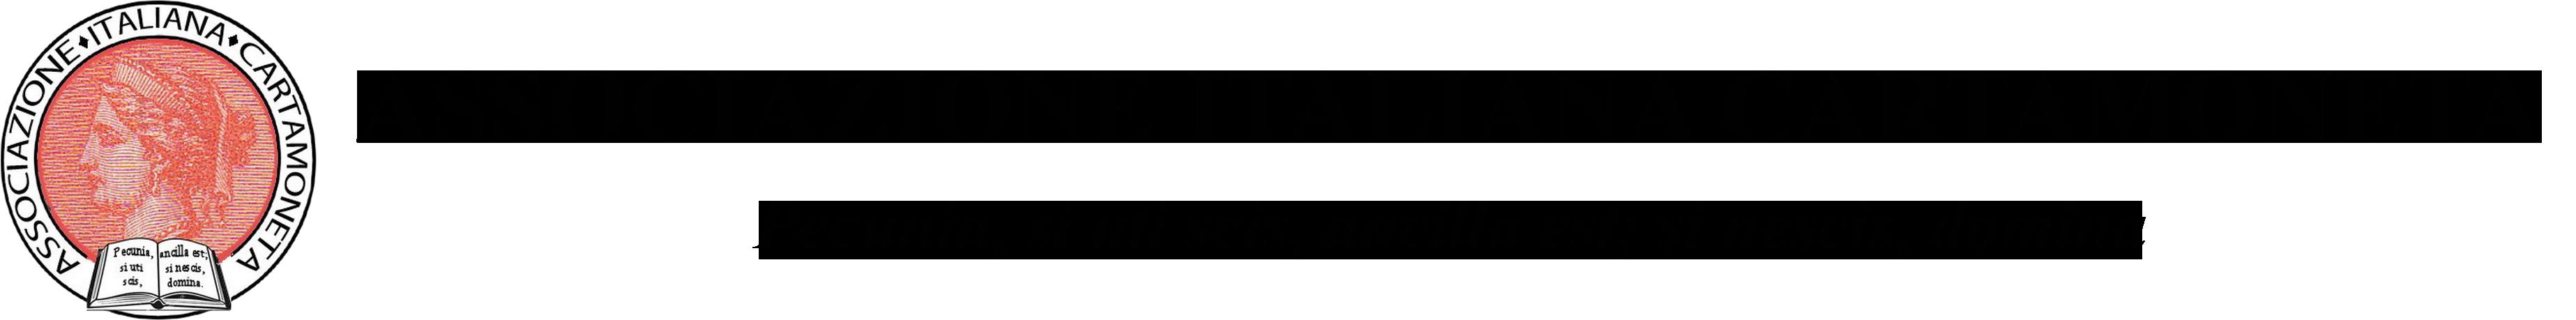 Associazione Italiana Cartamoneta - Roma